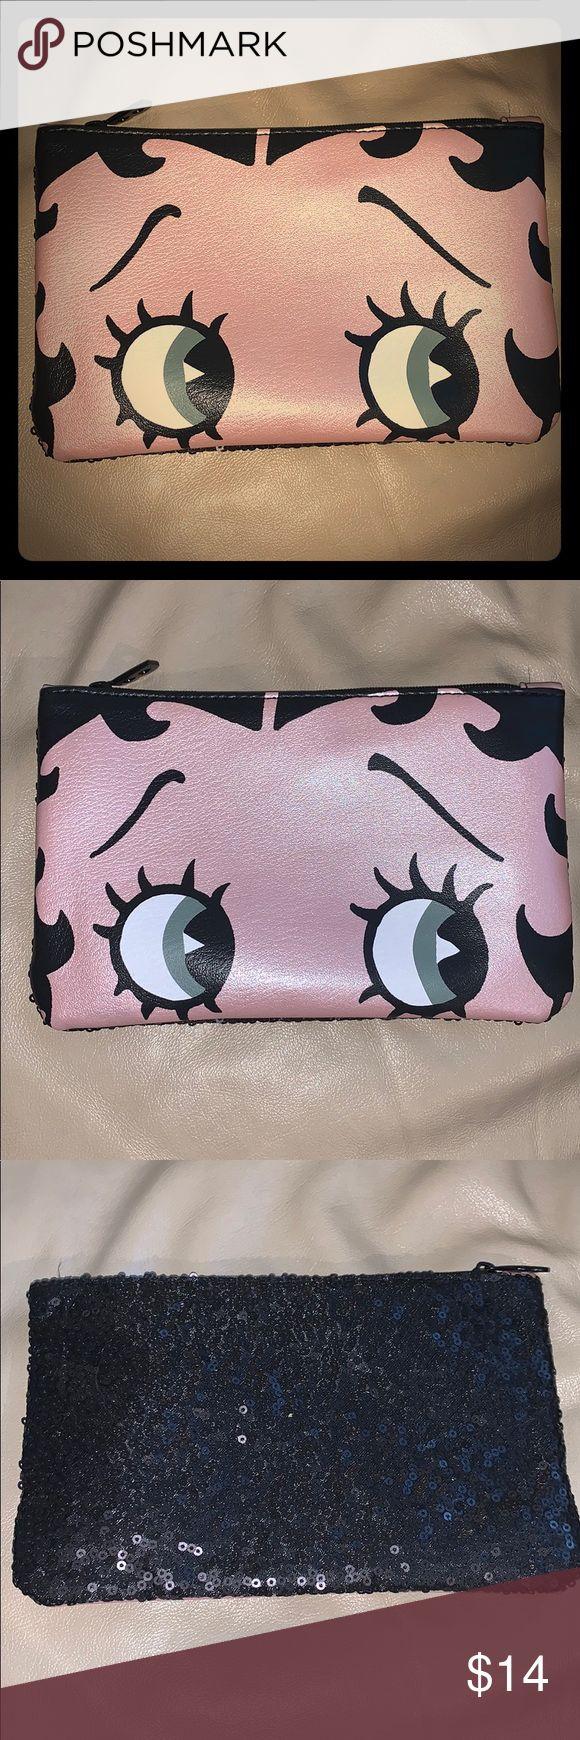 Betty Boop Ipsy makeup bag brand new New unused Ipsy